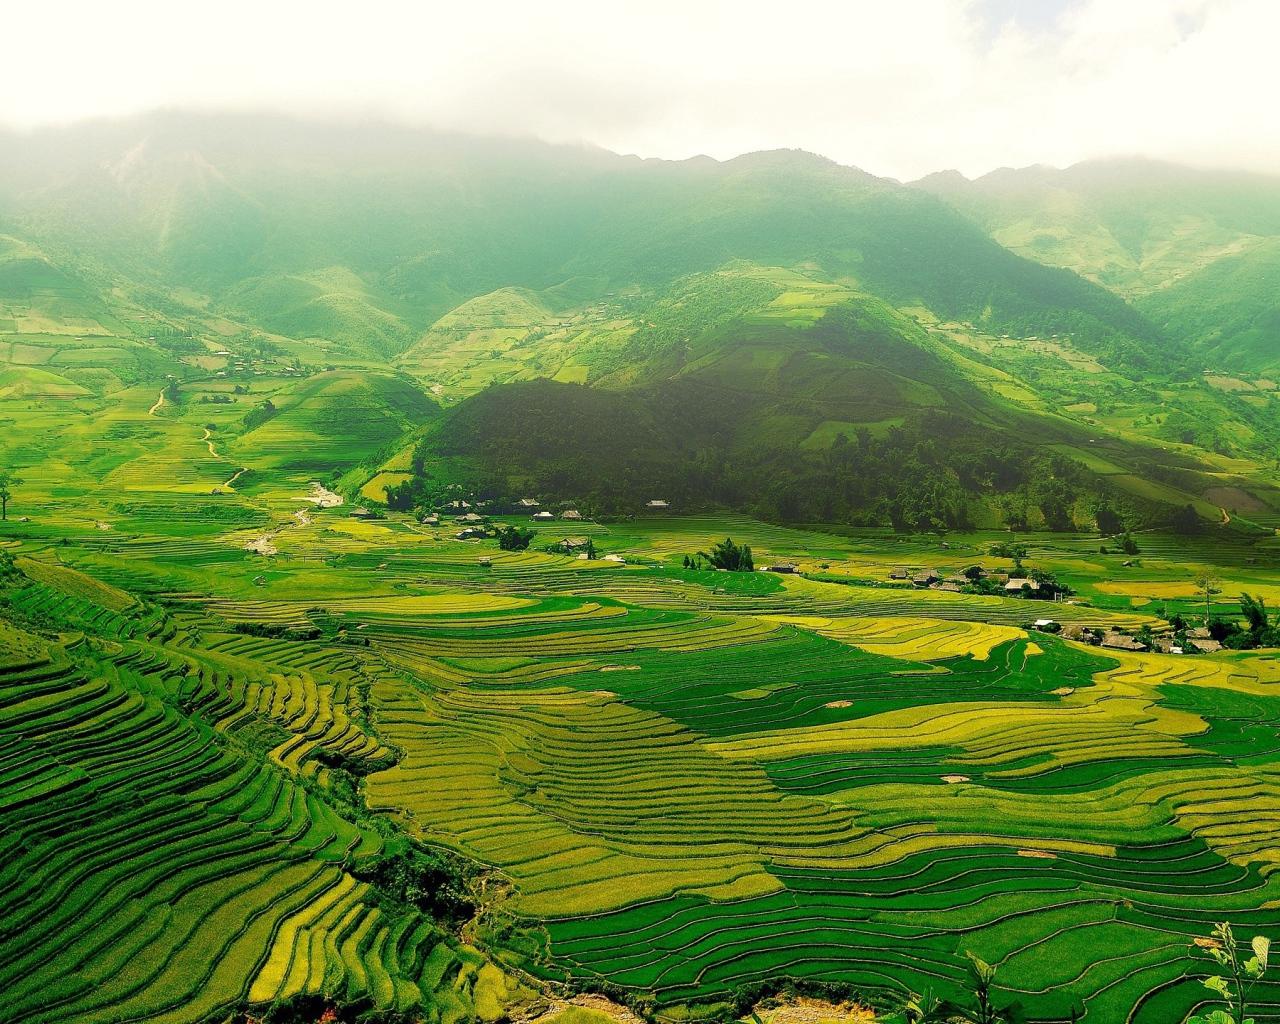 Зеленая долина картинка